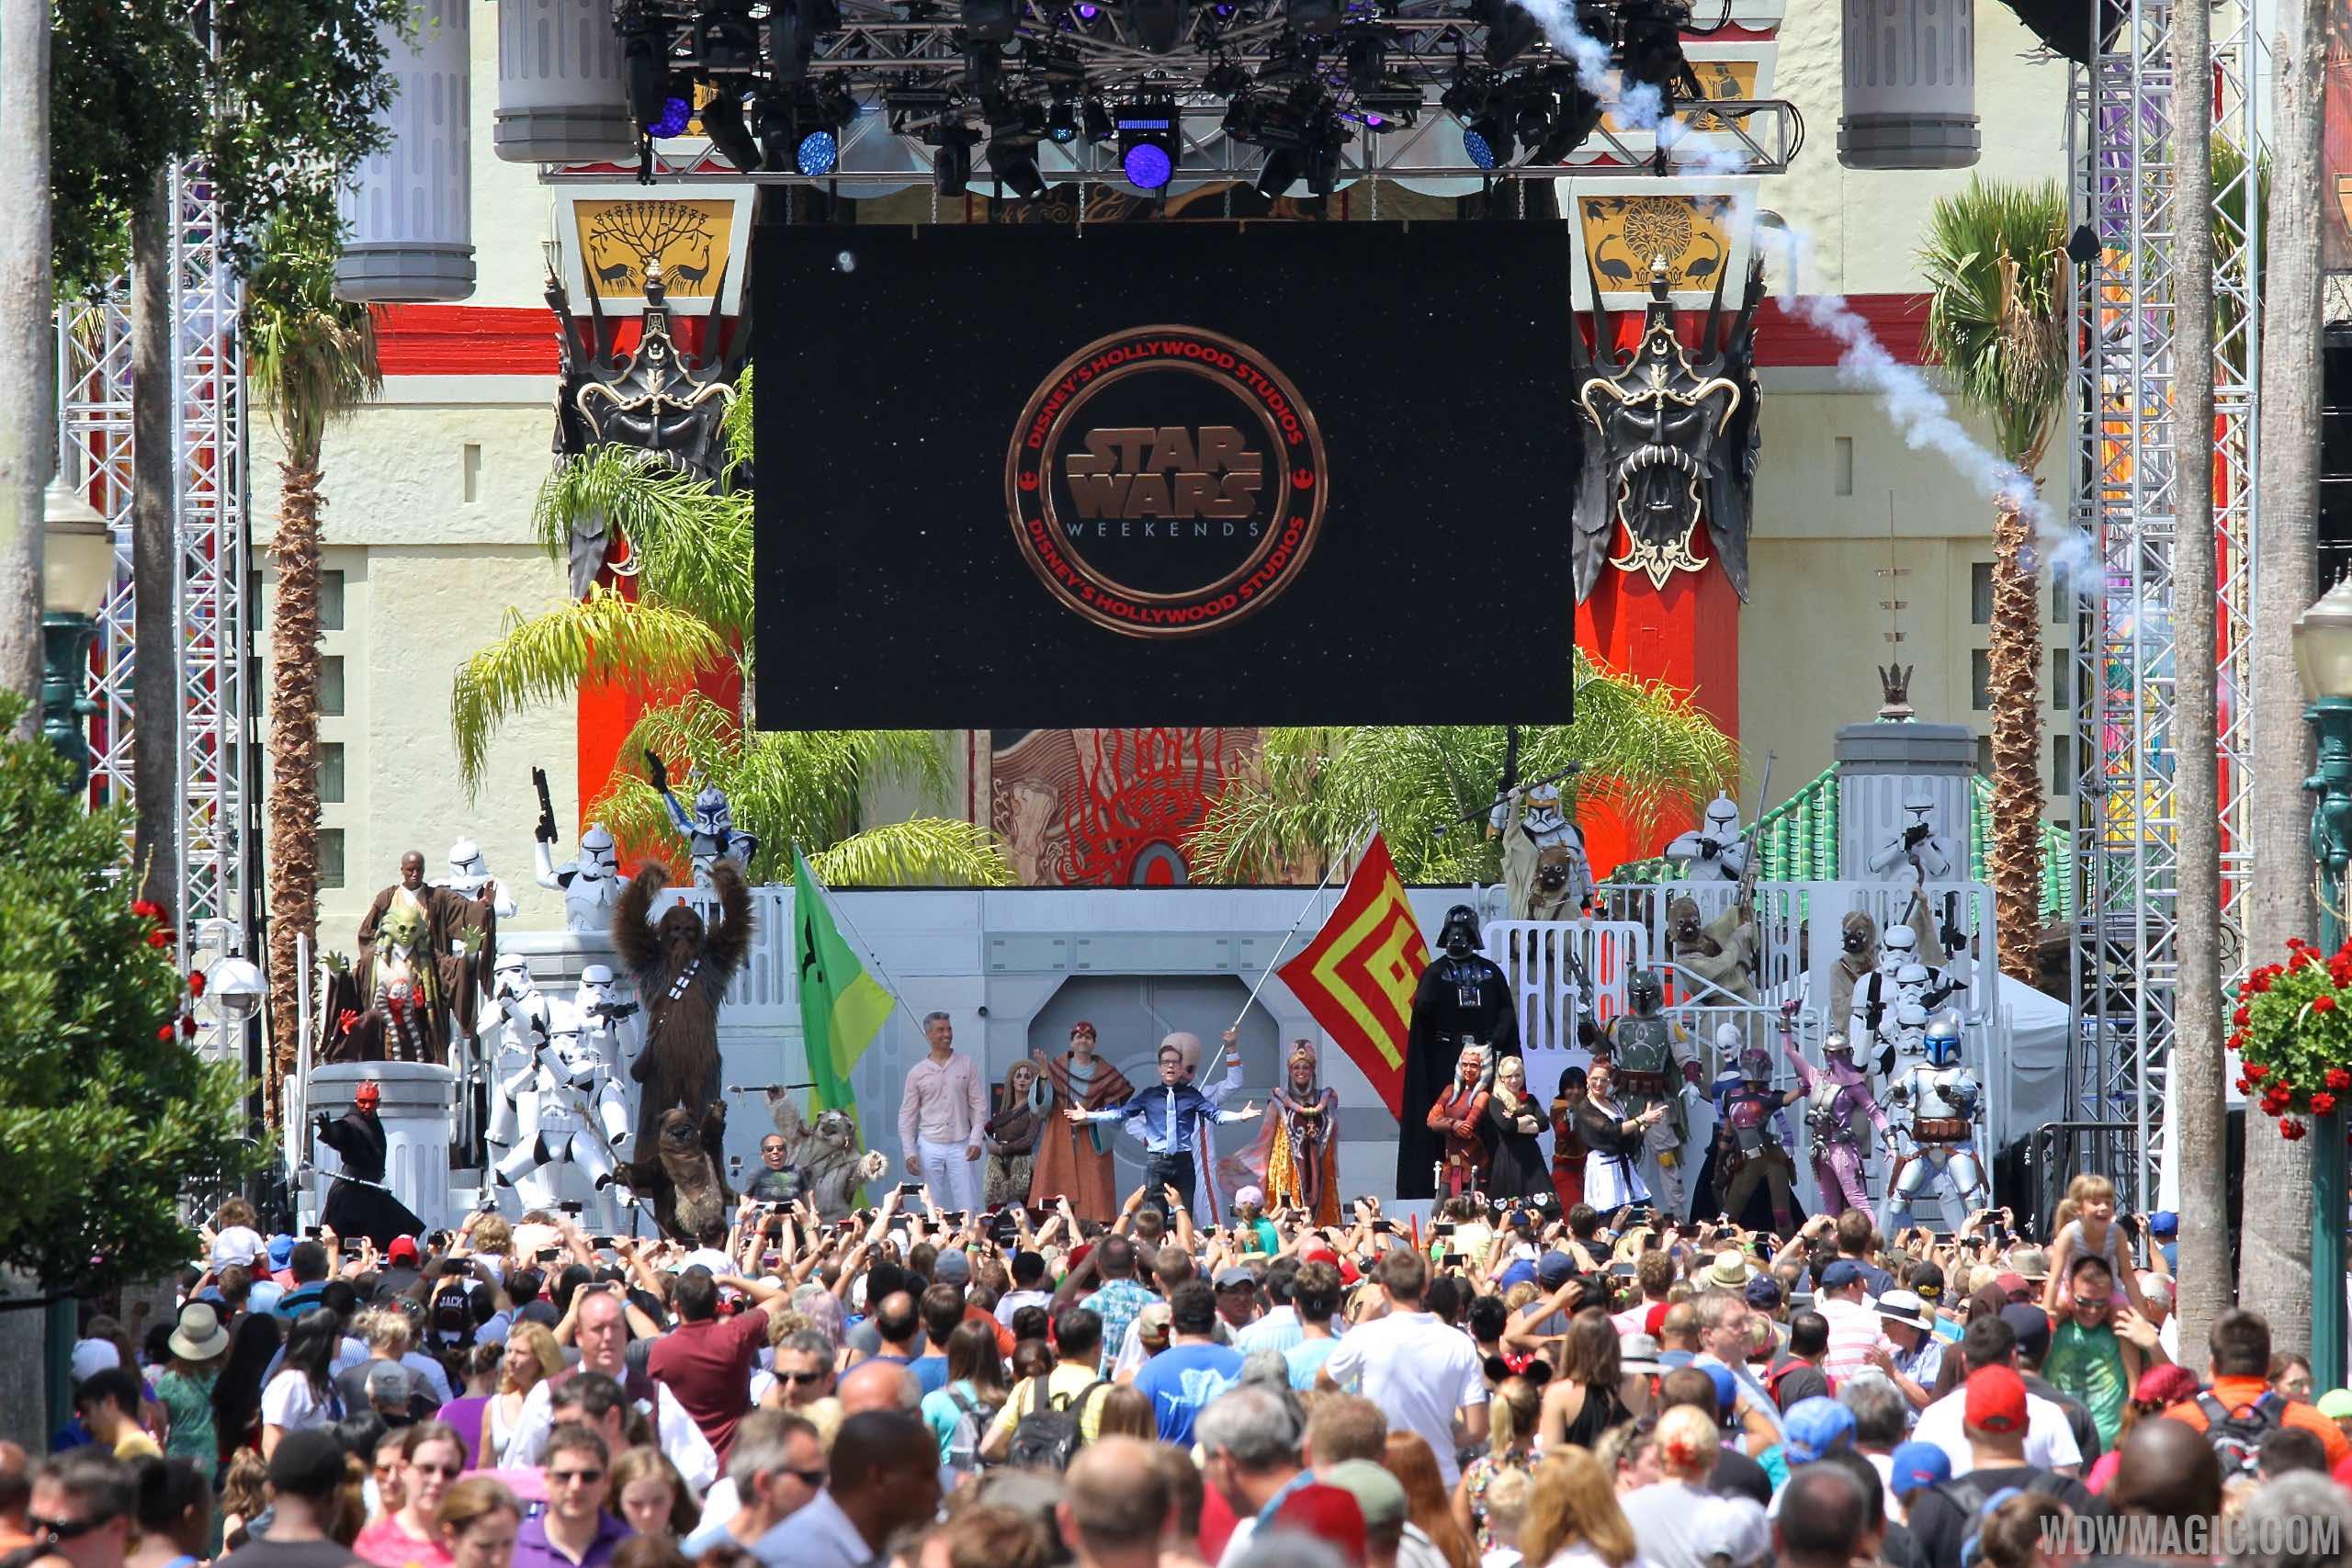 2015 Star Wars Weekends - Weekend 2 Legends of the Force motorcade celebrities